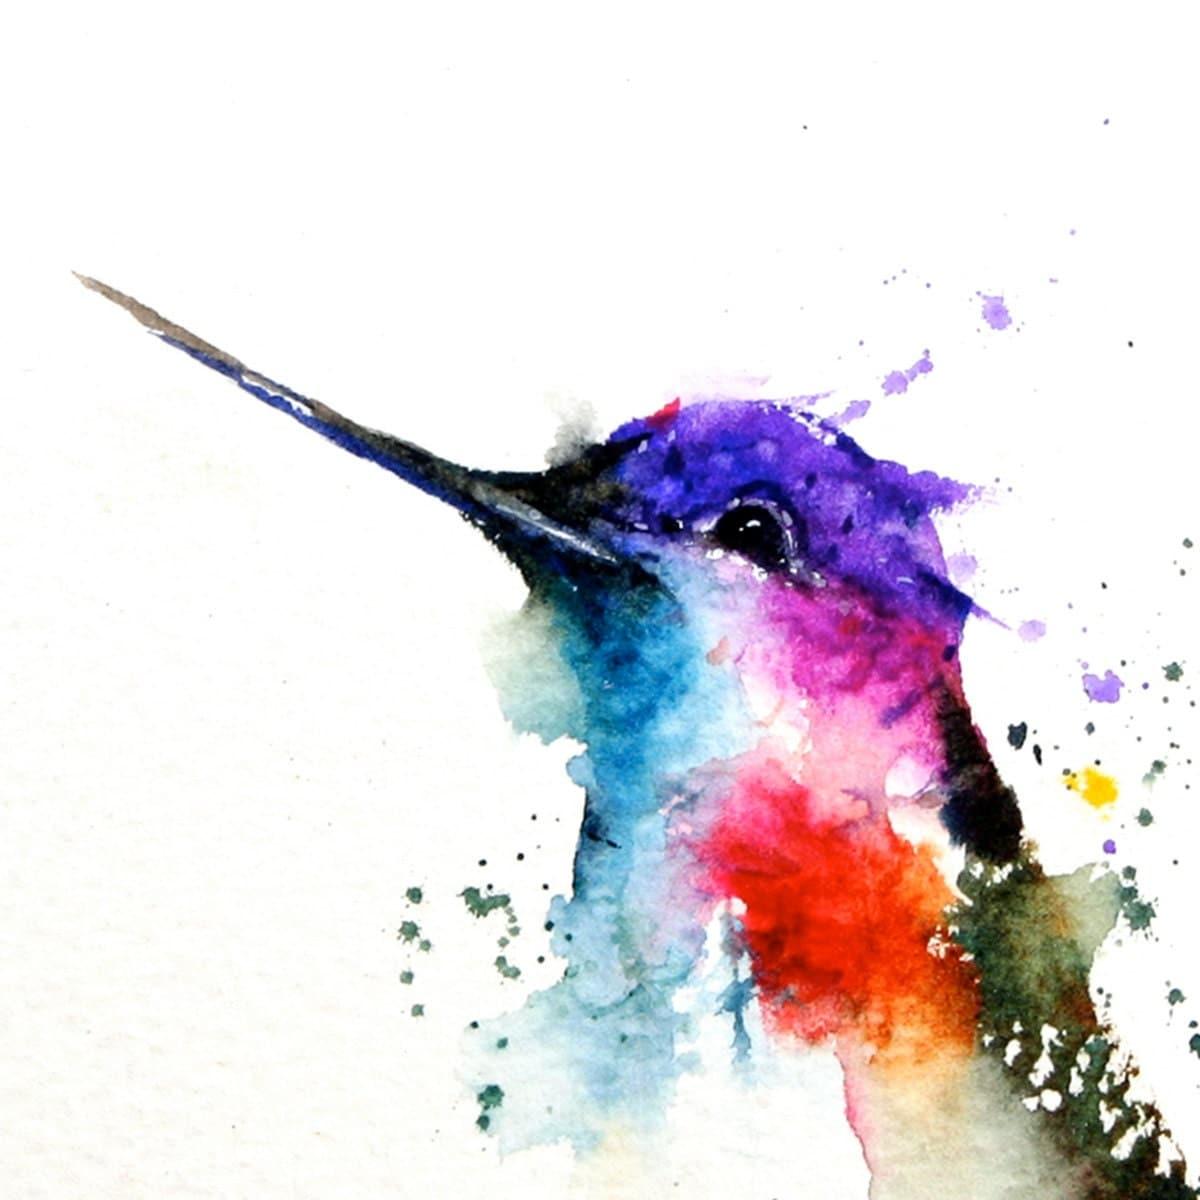 HUMMINGBIRD Original Watercolor Painting By DeanCrouserArt